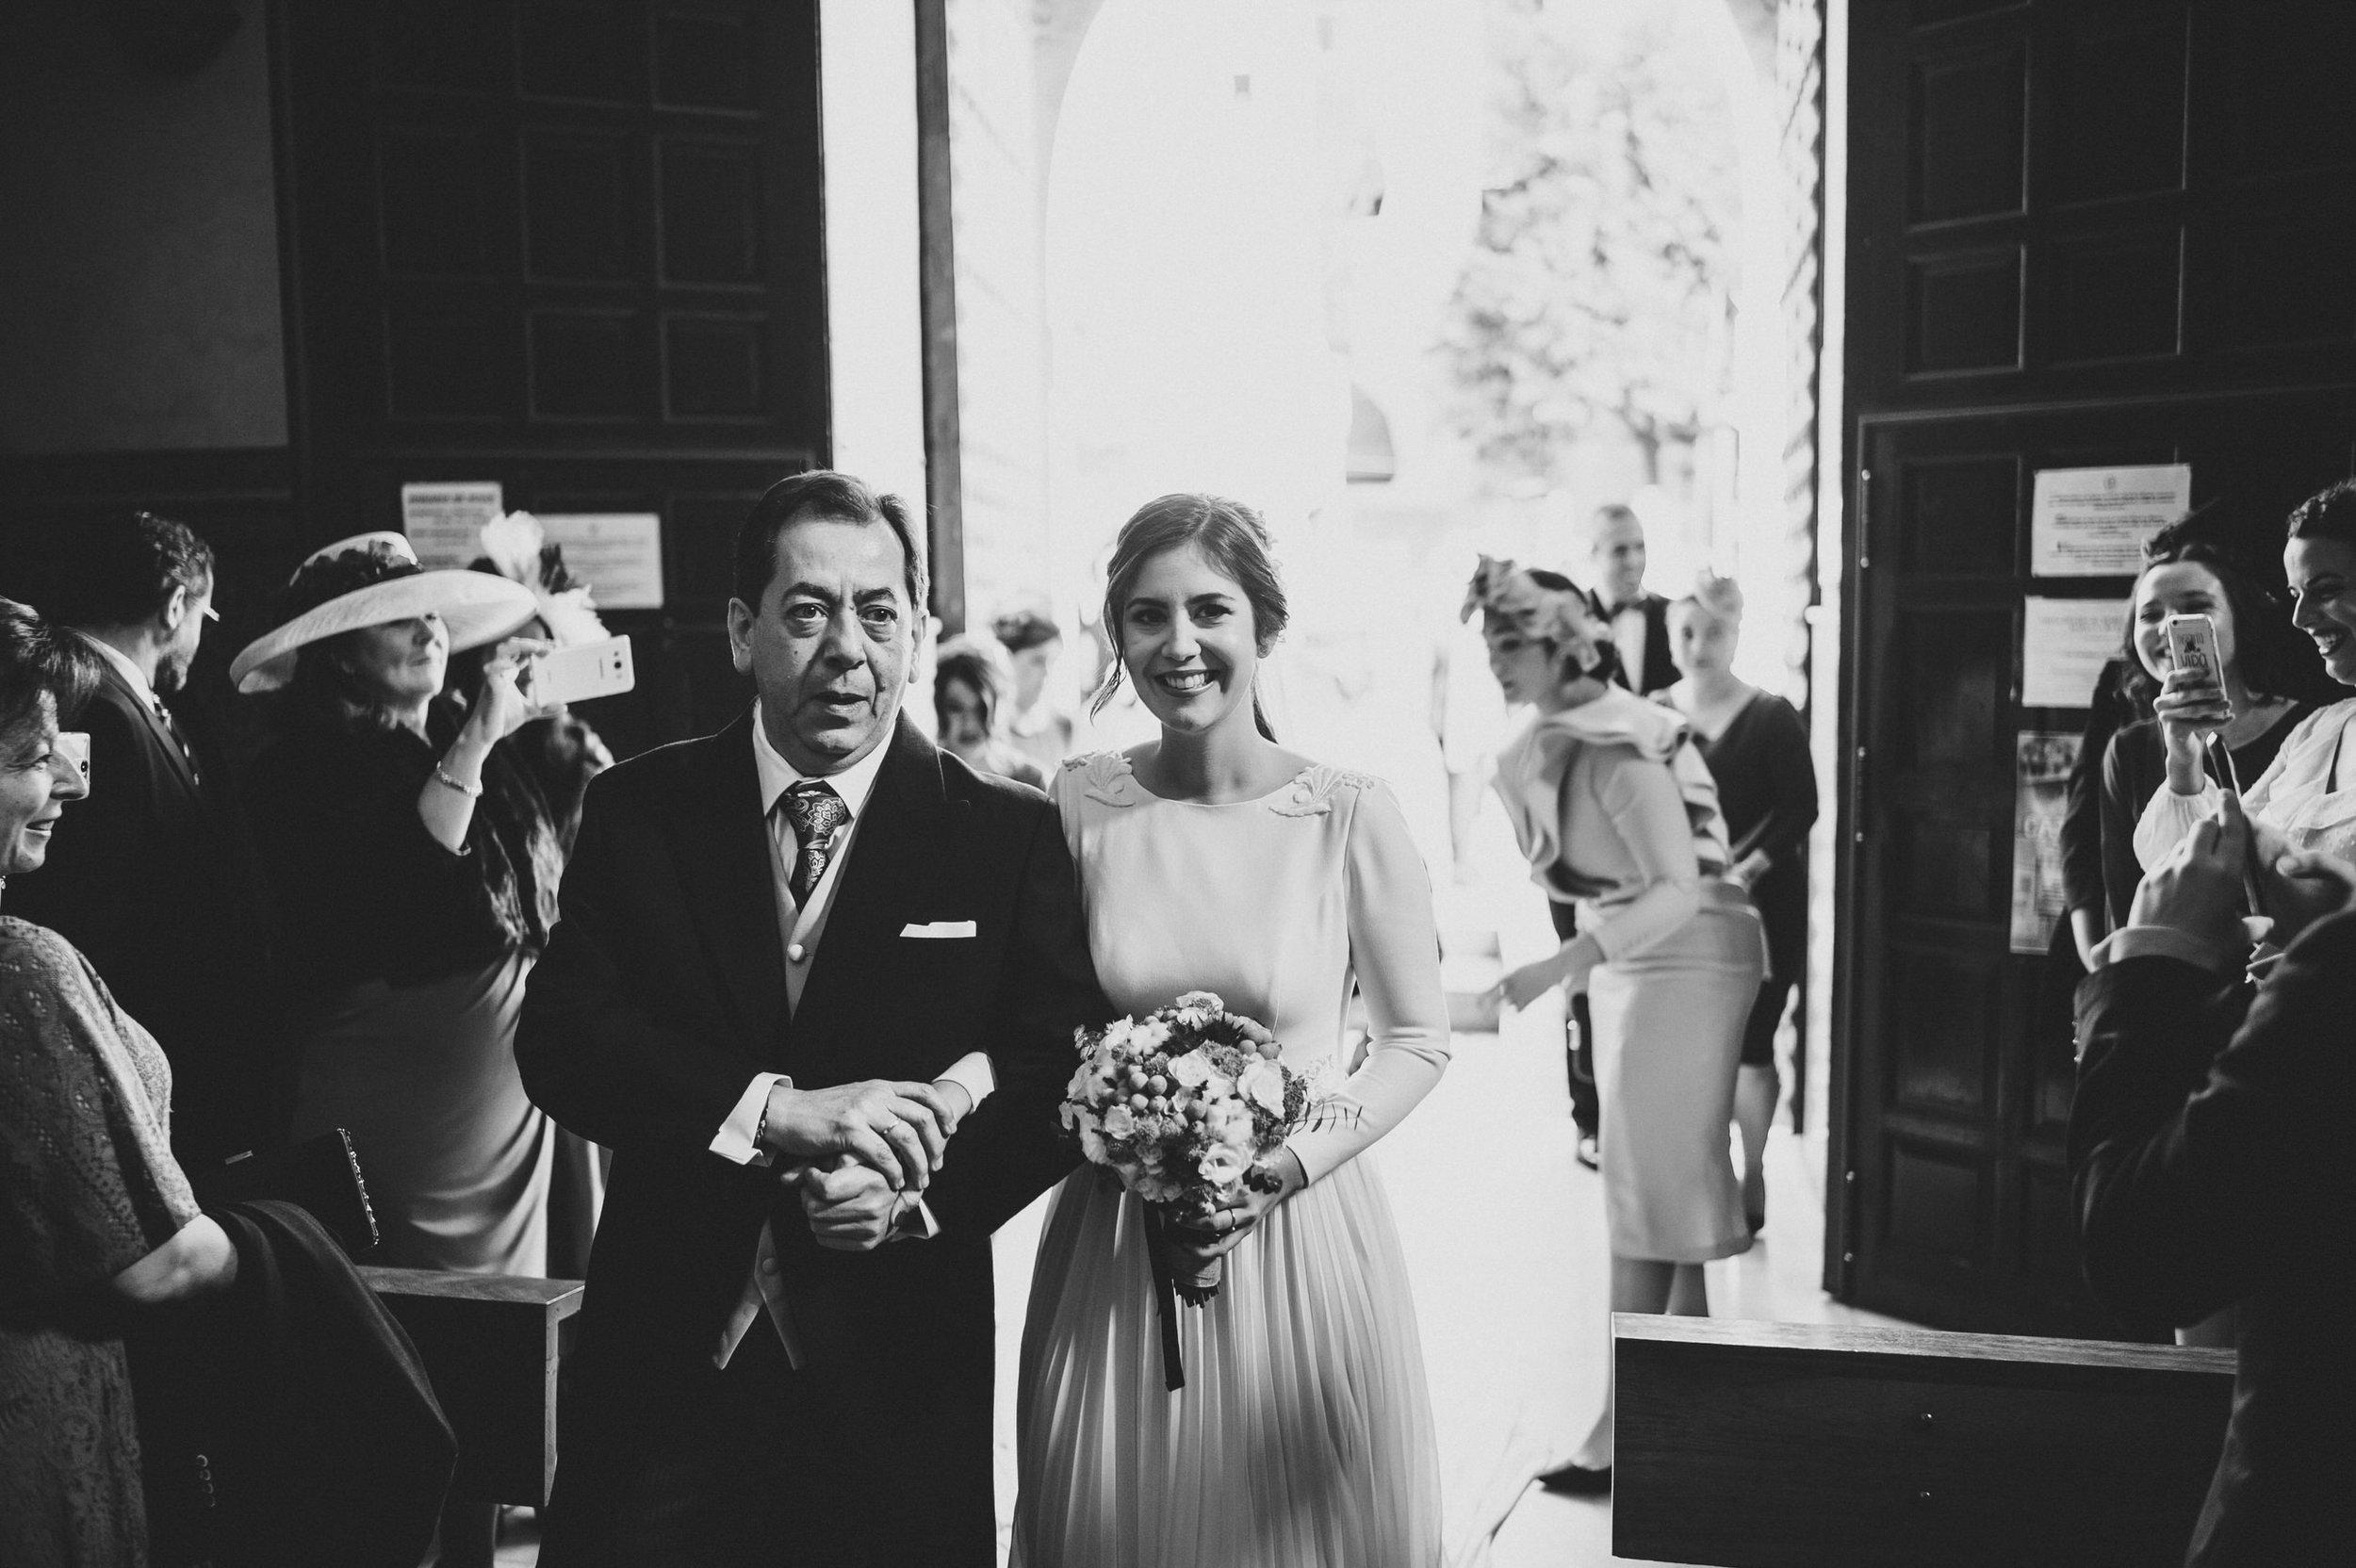 andres+amarillo+fotografo+boda+sevilla+santa+maria+de+la+blanca+al+yamanah (45).JPG